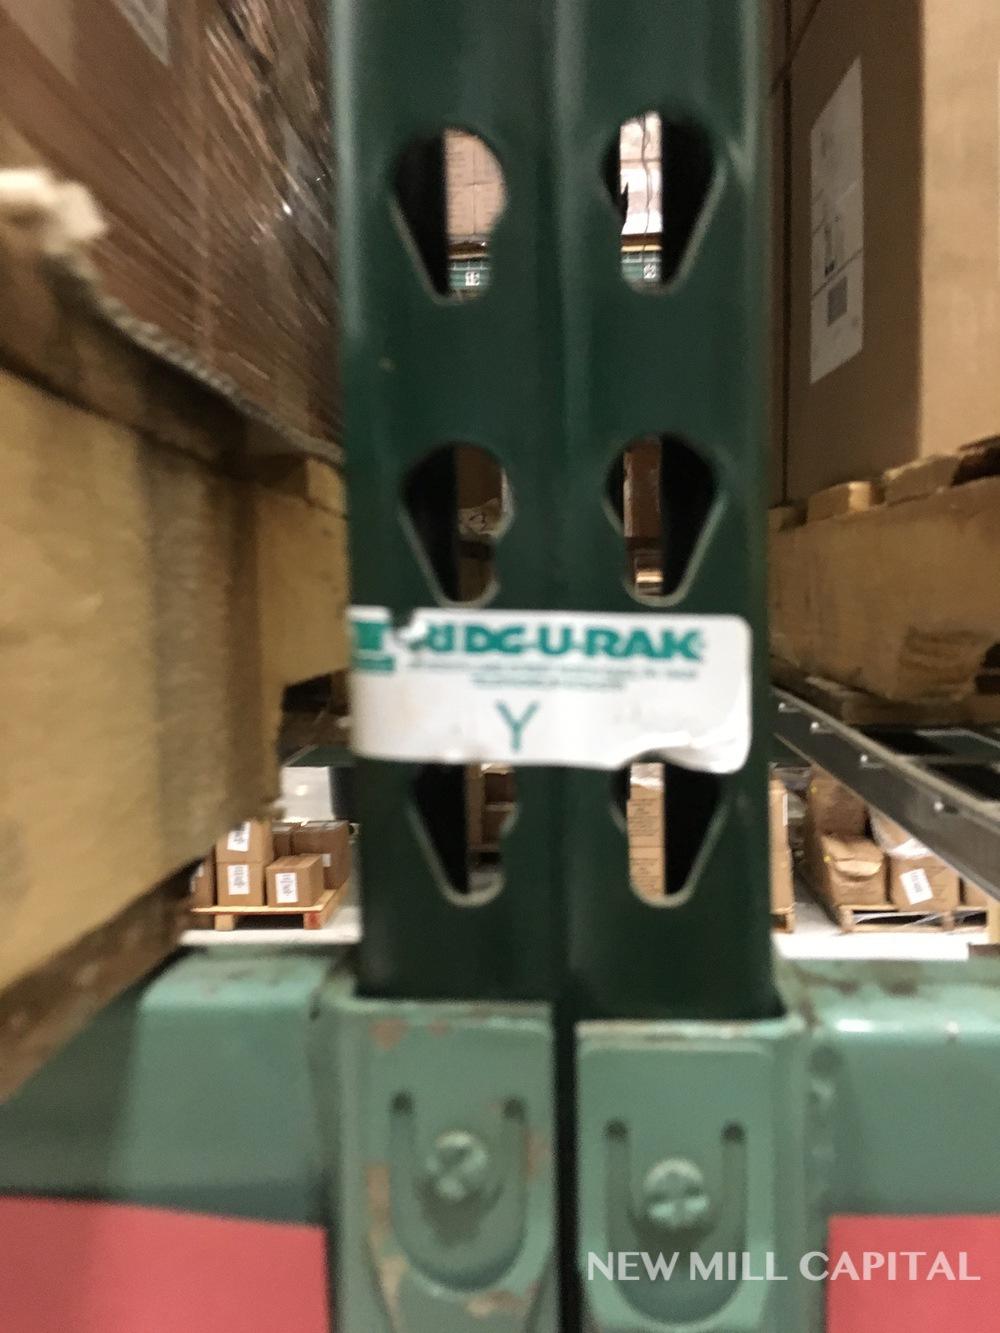 Lot 20 - Ridg-U-Rak Teardrop Pallet Racking, (32) Uprights (3in x 2.25in Columns, | Rig: See Lot Description